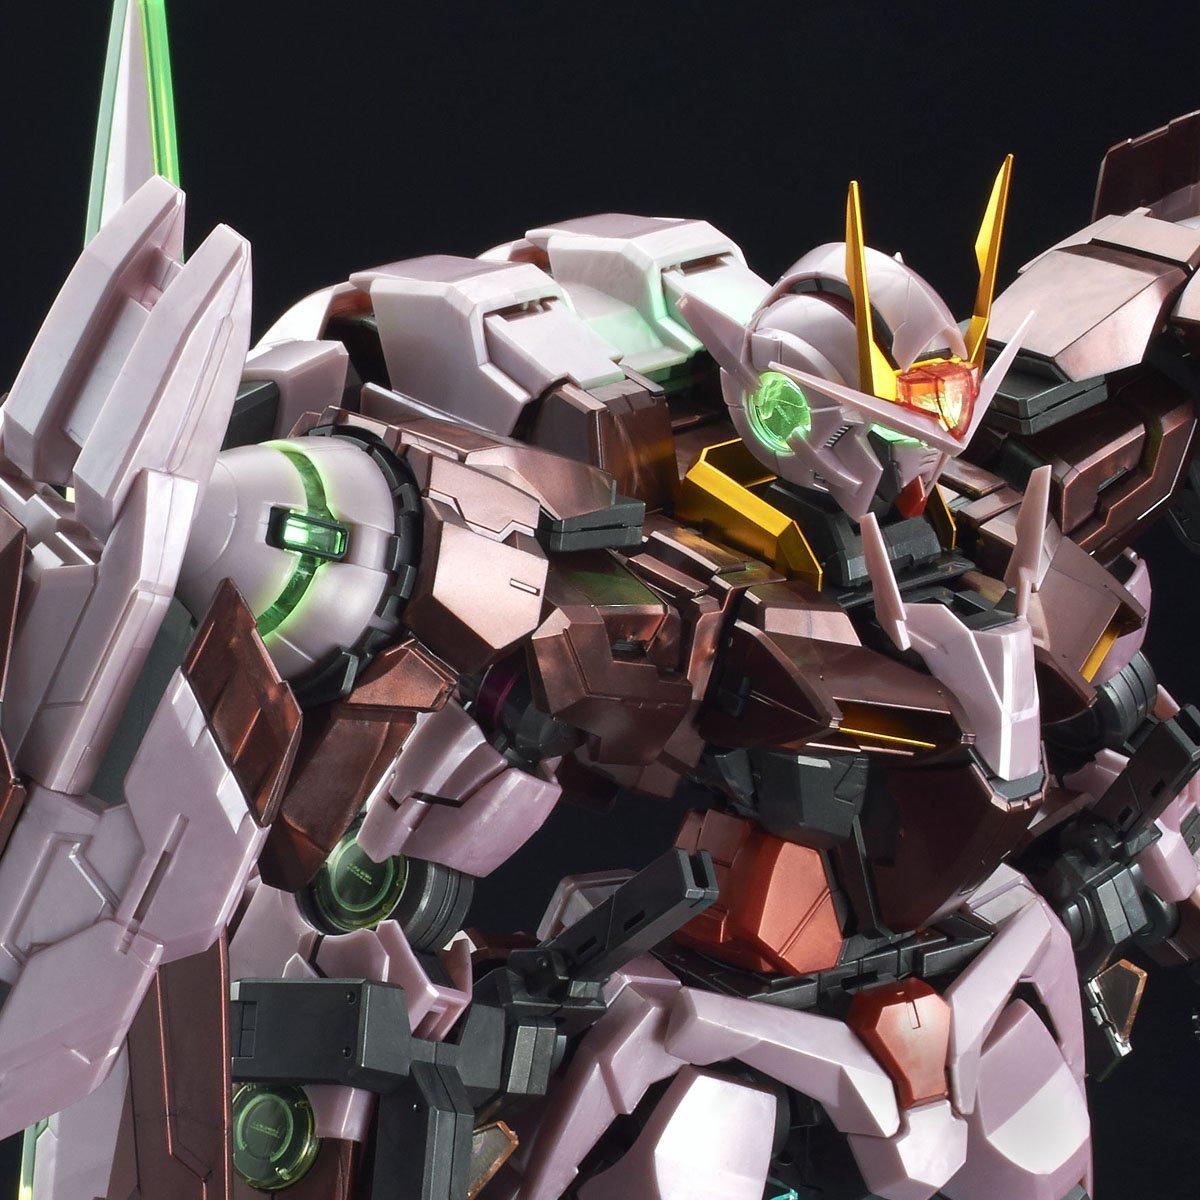 PG 機動戦士ガンダムOOトランザムライザー 1/60 B071NWGSR6